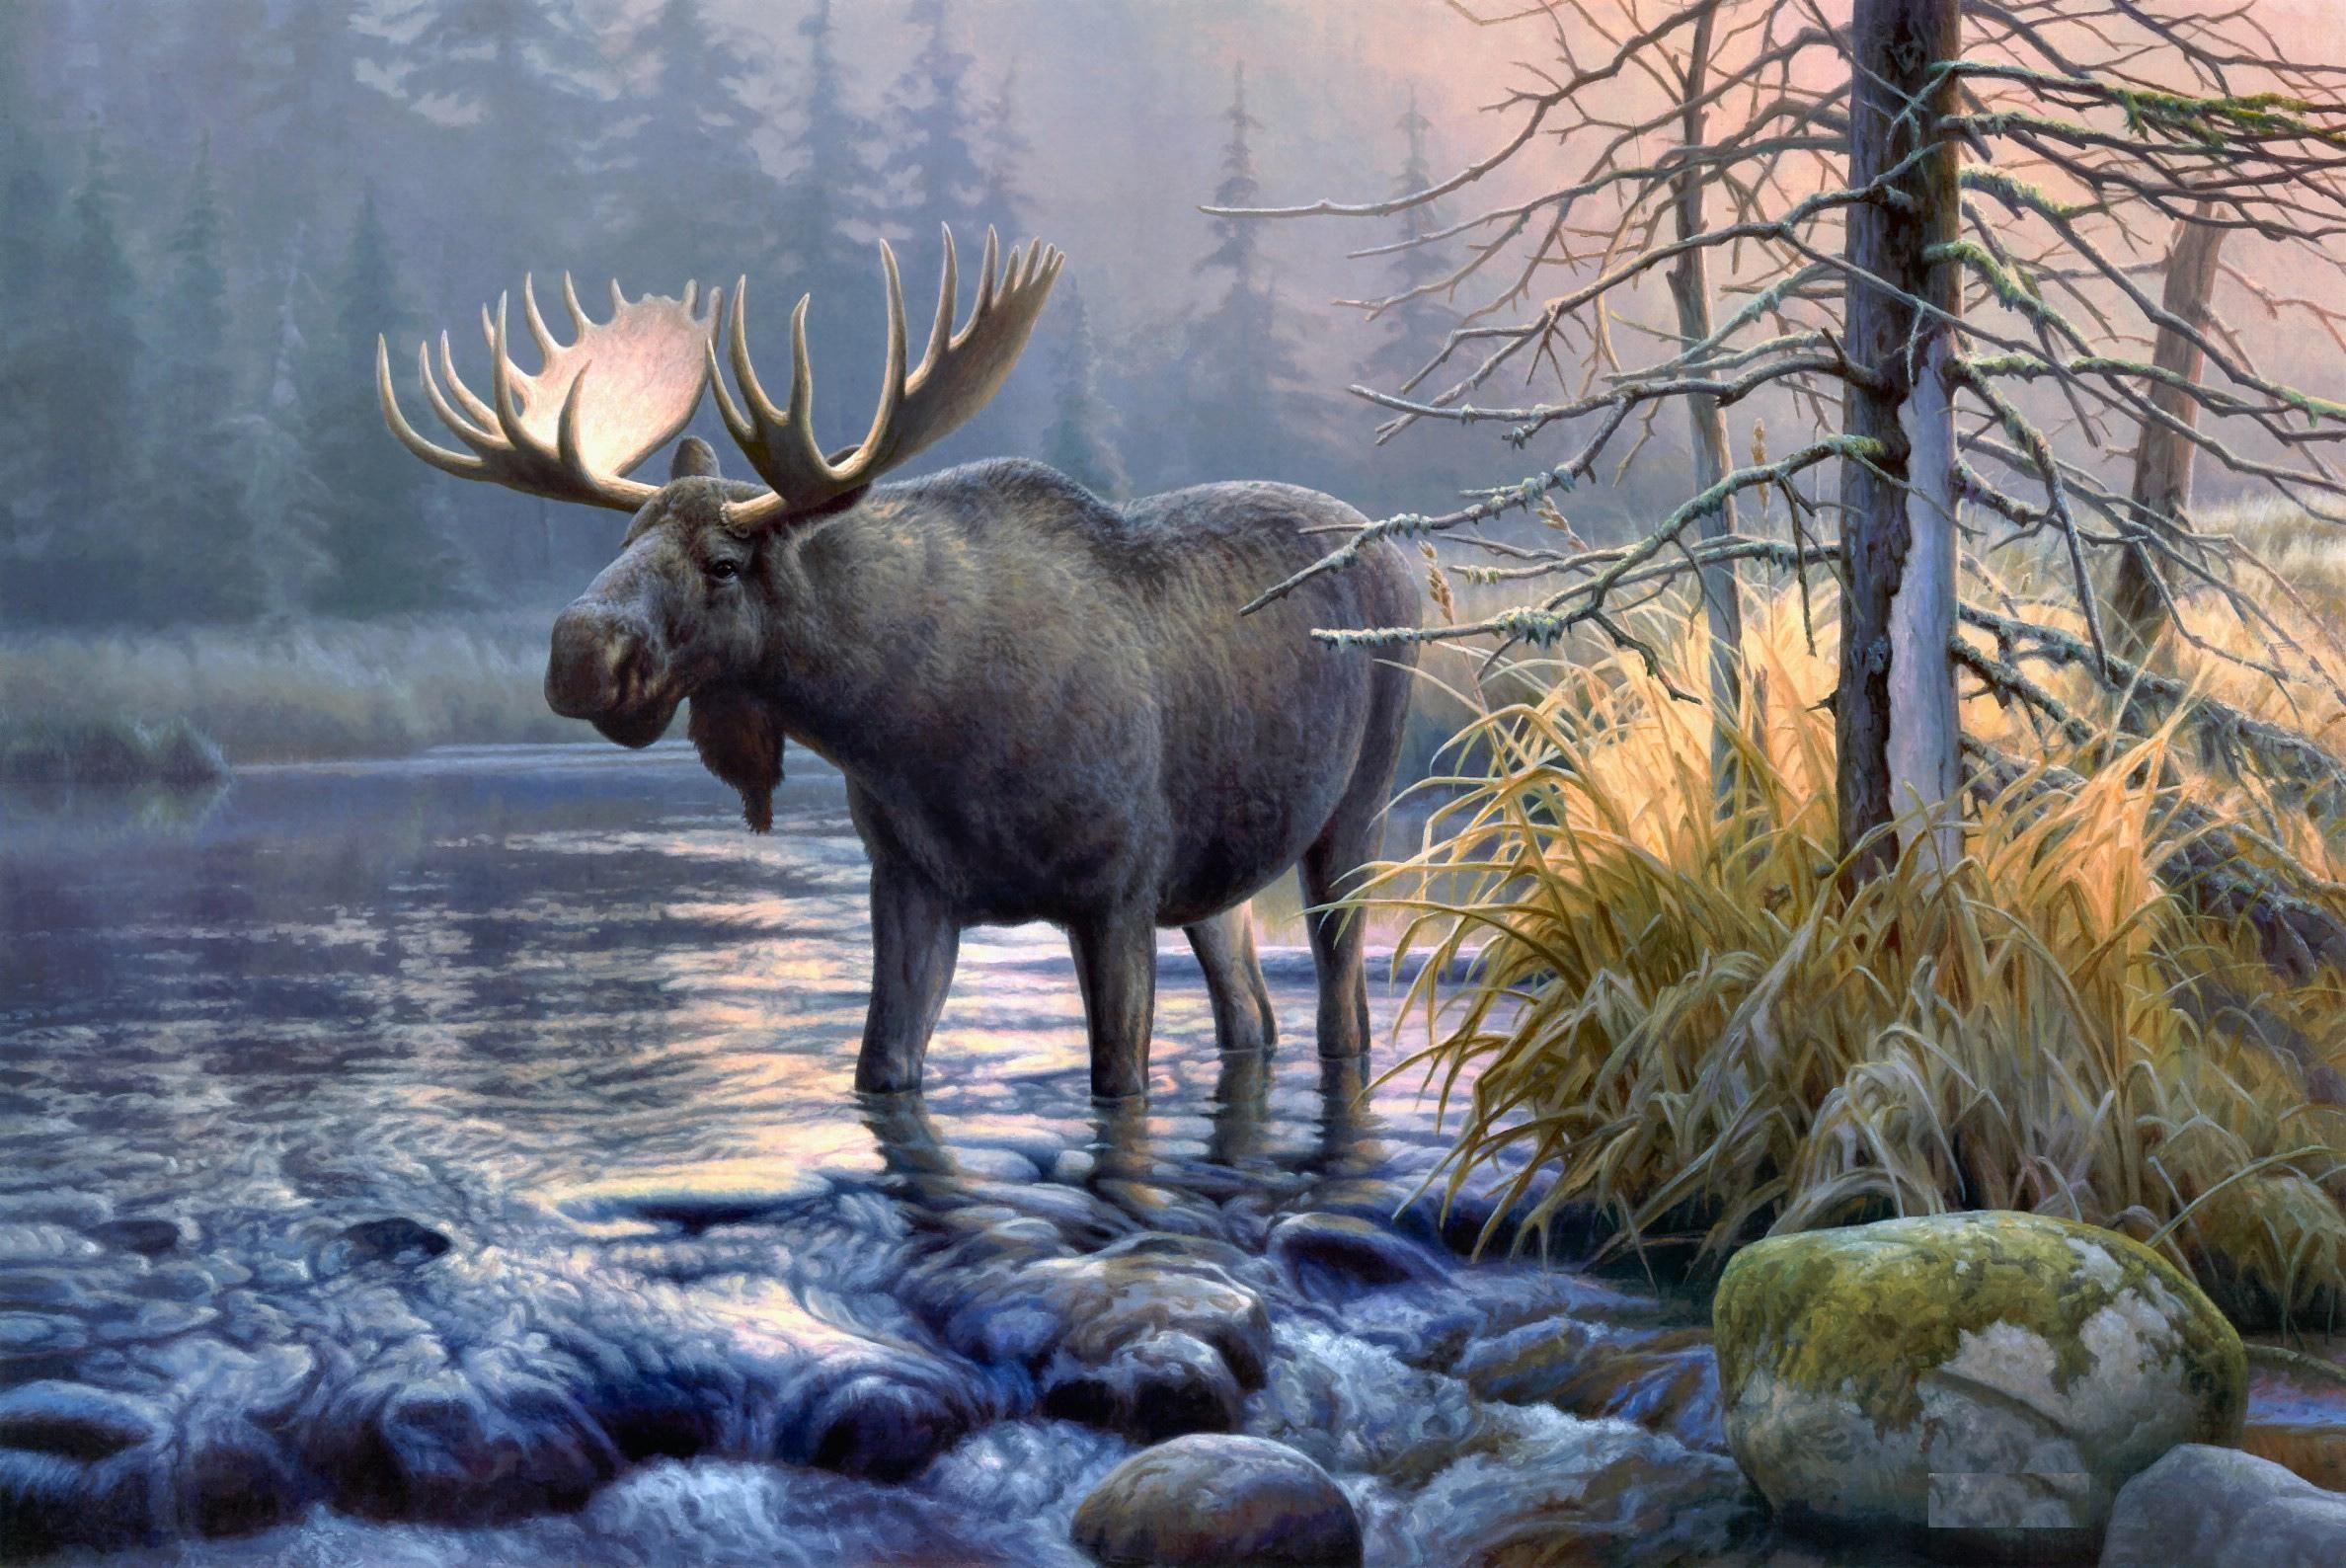 Moose HD Wallpapers Moose Desktop Pictures Cool